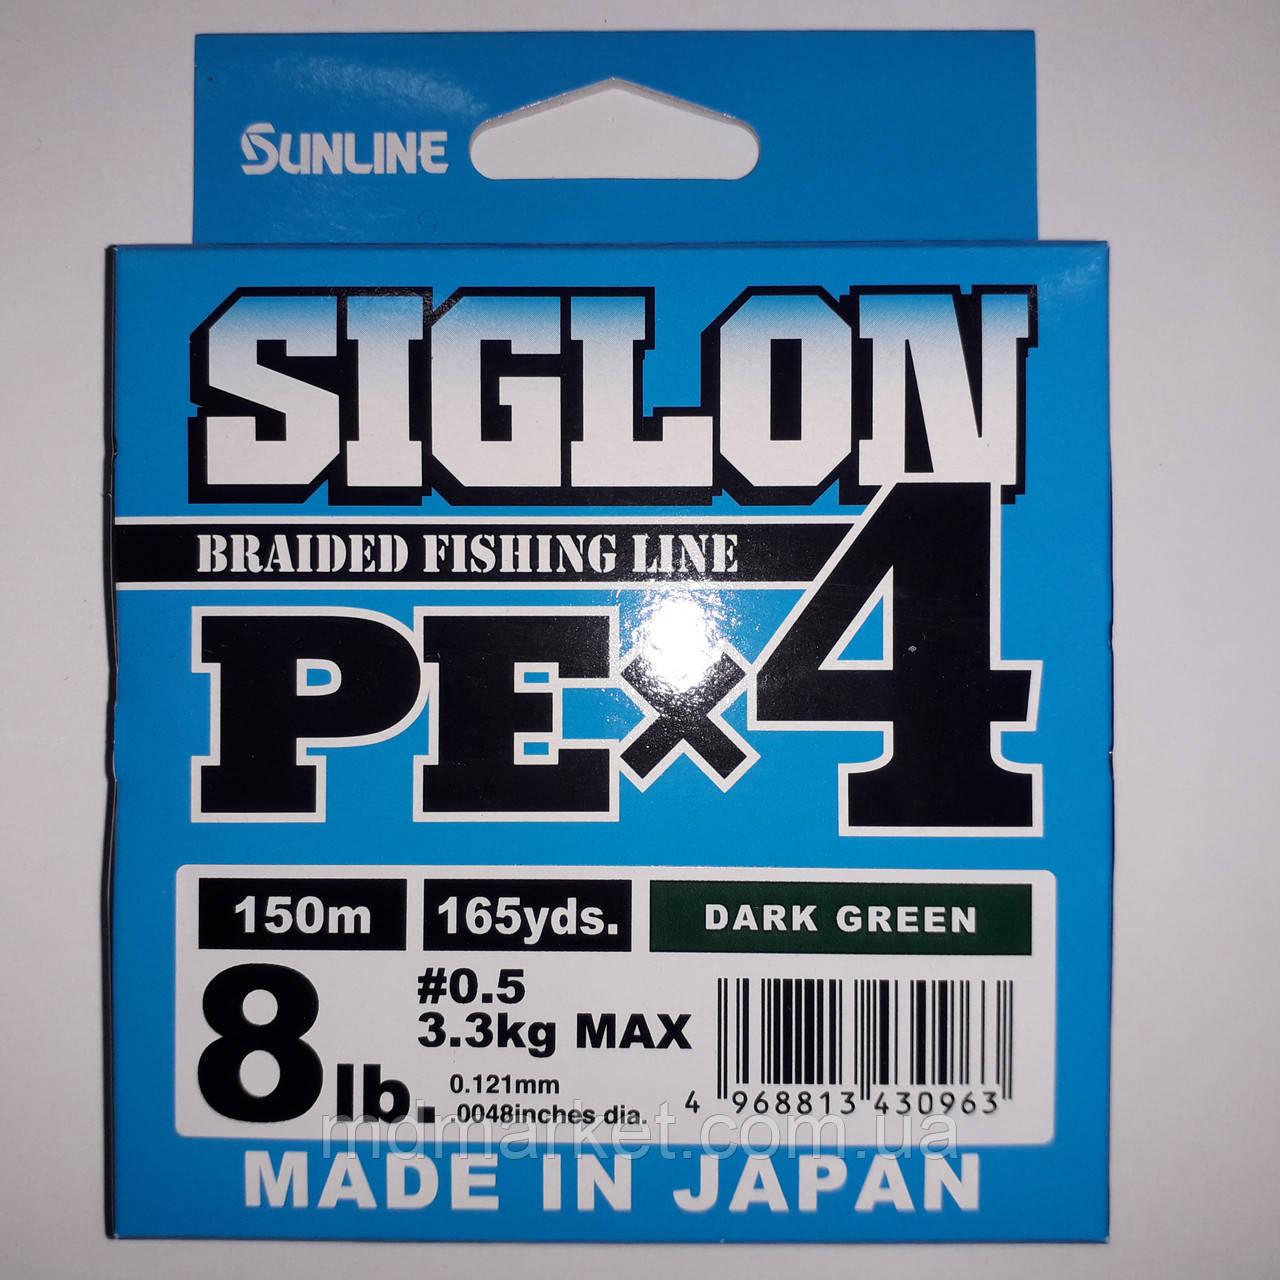 Шнур Sunline Siglon PE х4 150m (салатовый) #0.5 8lb/3.3kg